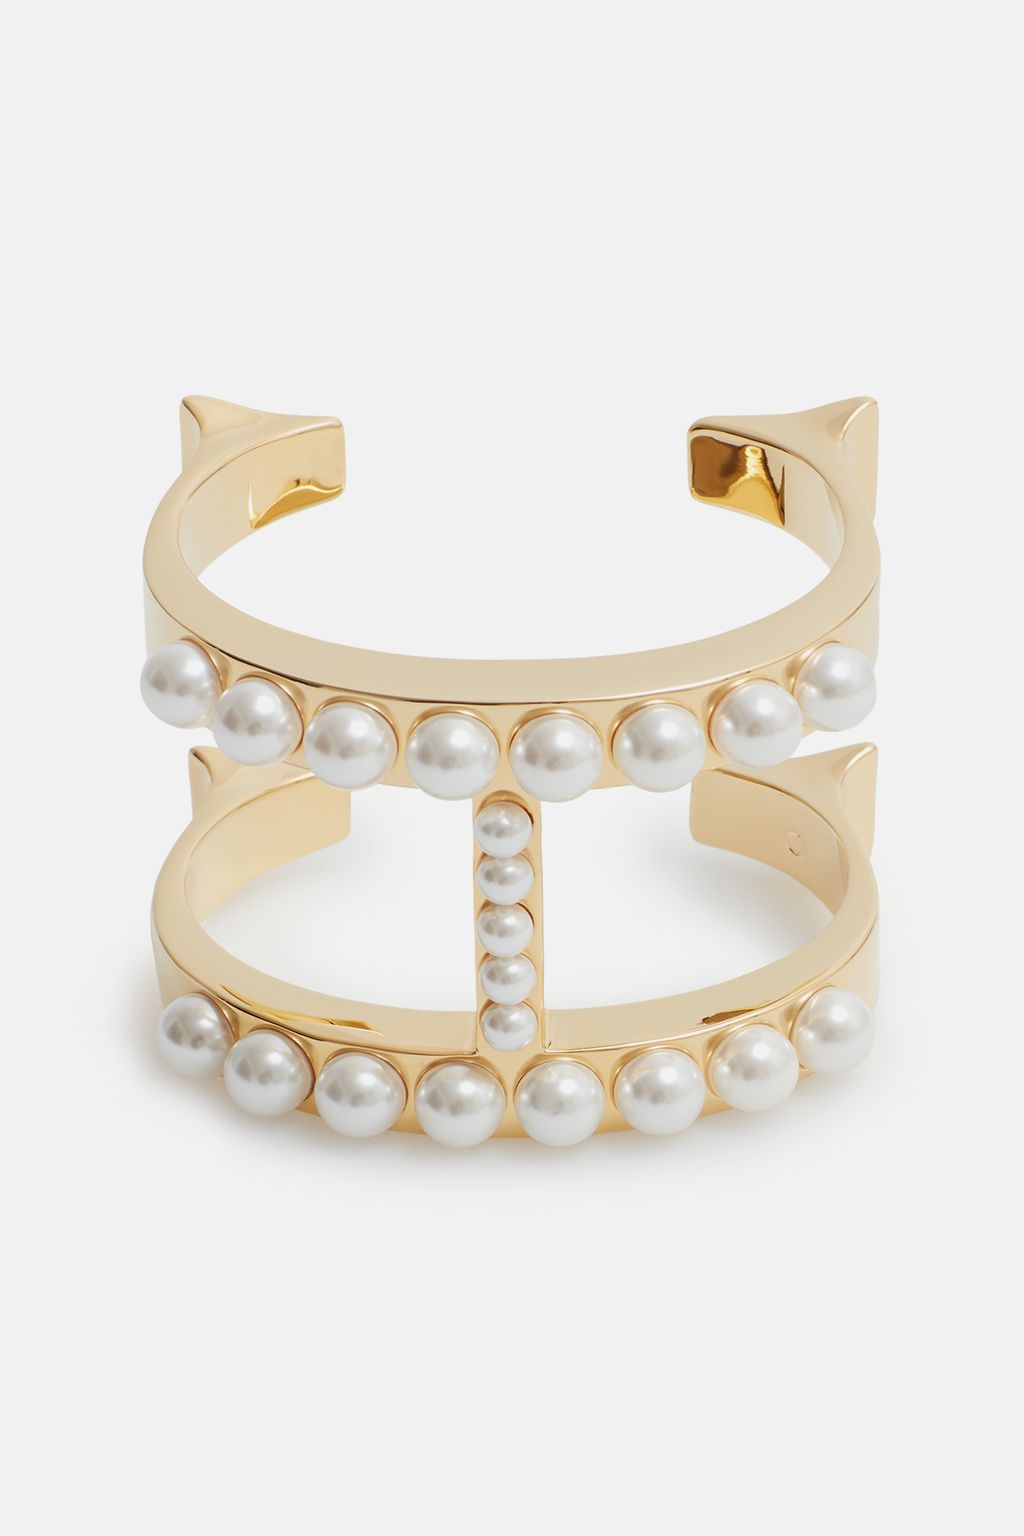 Insignia cuff with pearls